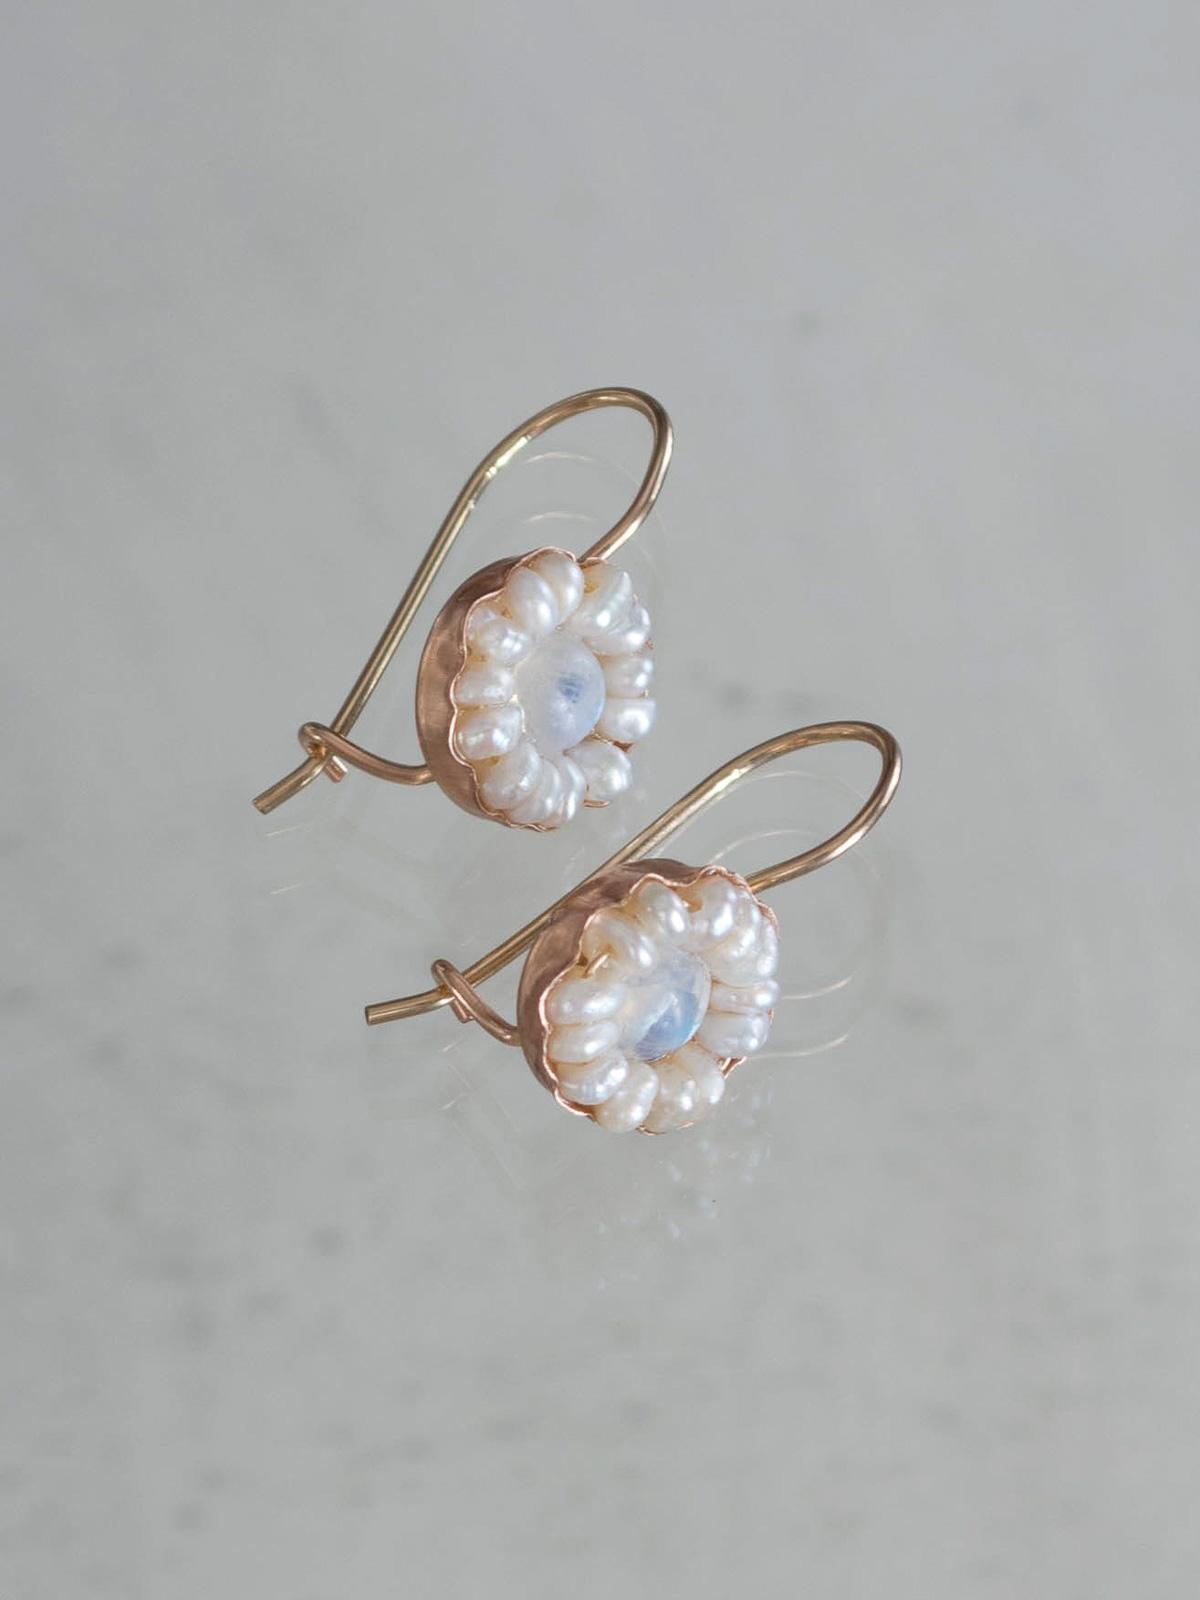 db4cf974ff earrings Daisy moonstone and pearls